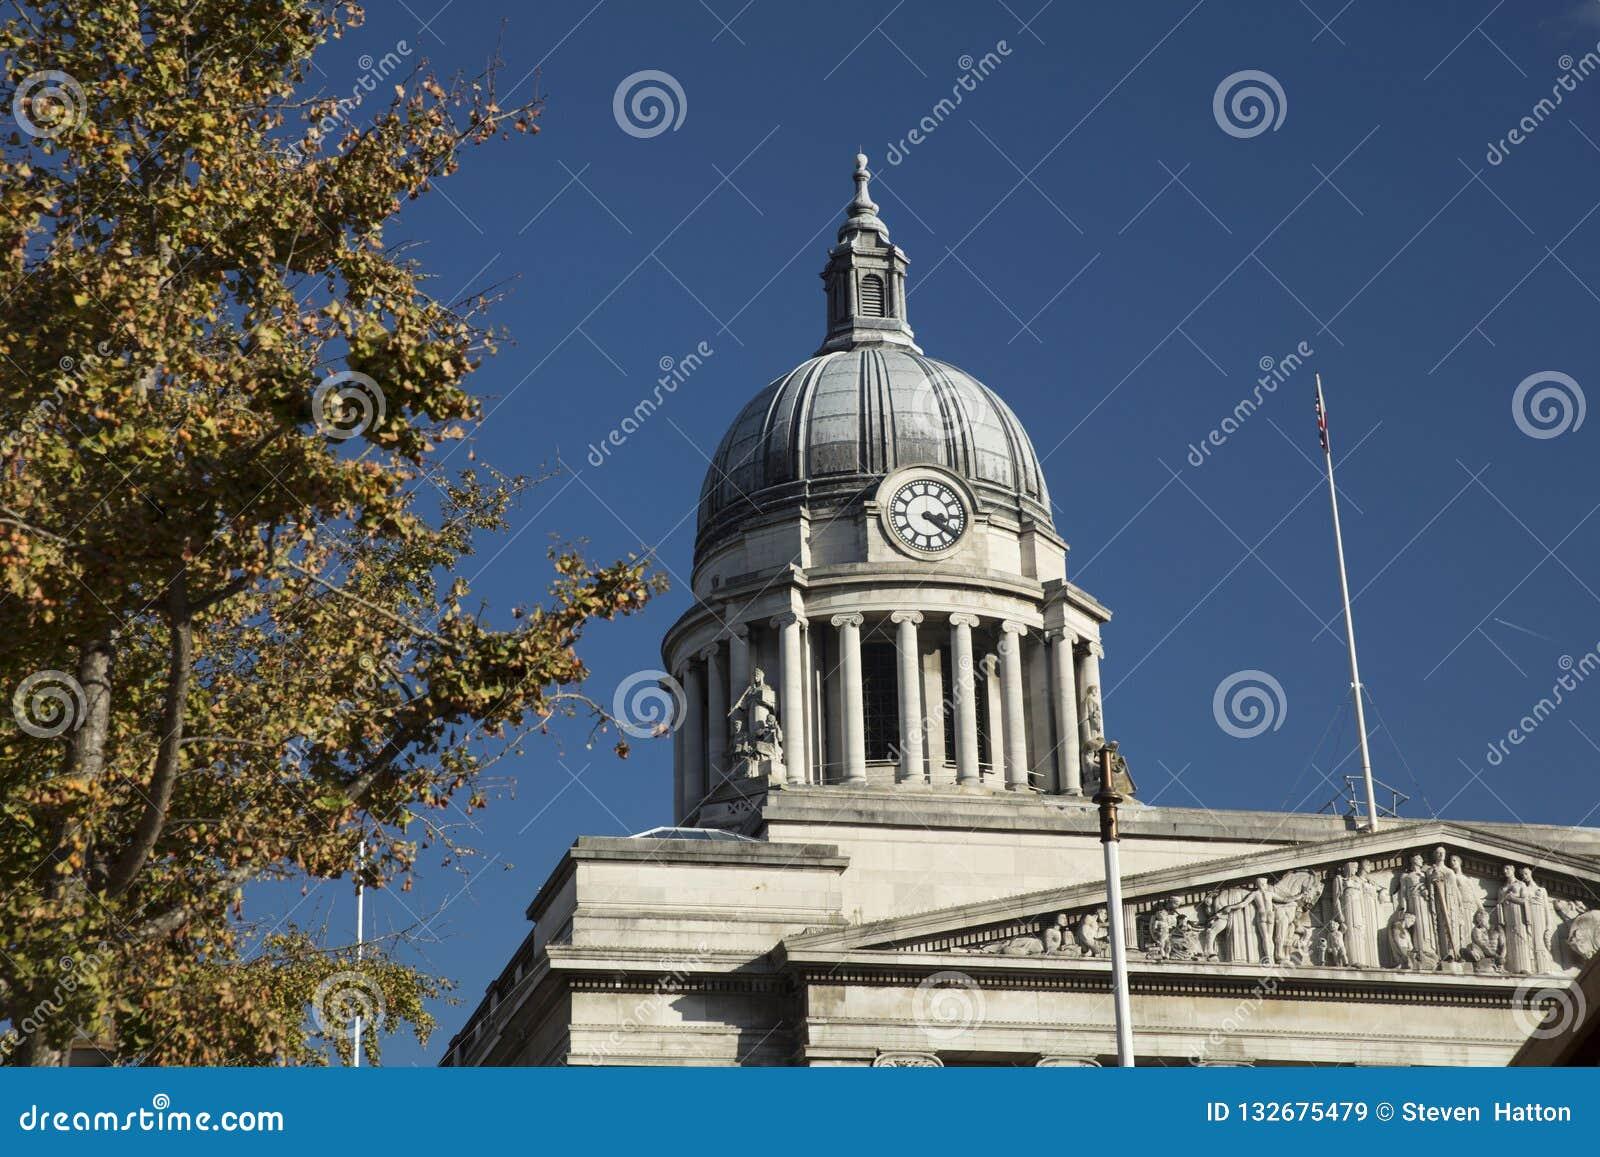 Nottingham, Nottinghamshire, UK: October 2018: Dome of City Hall